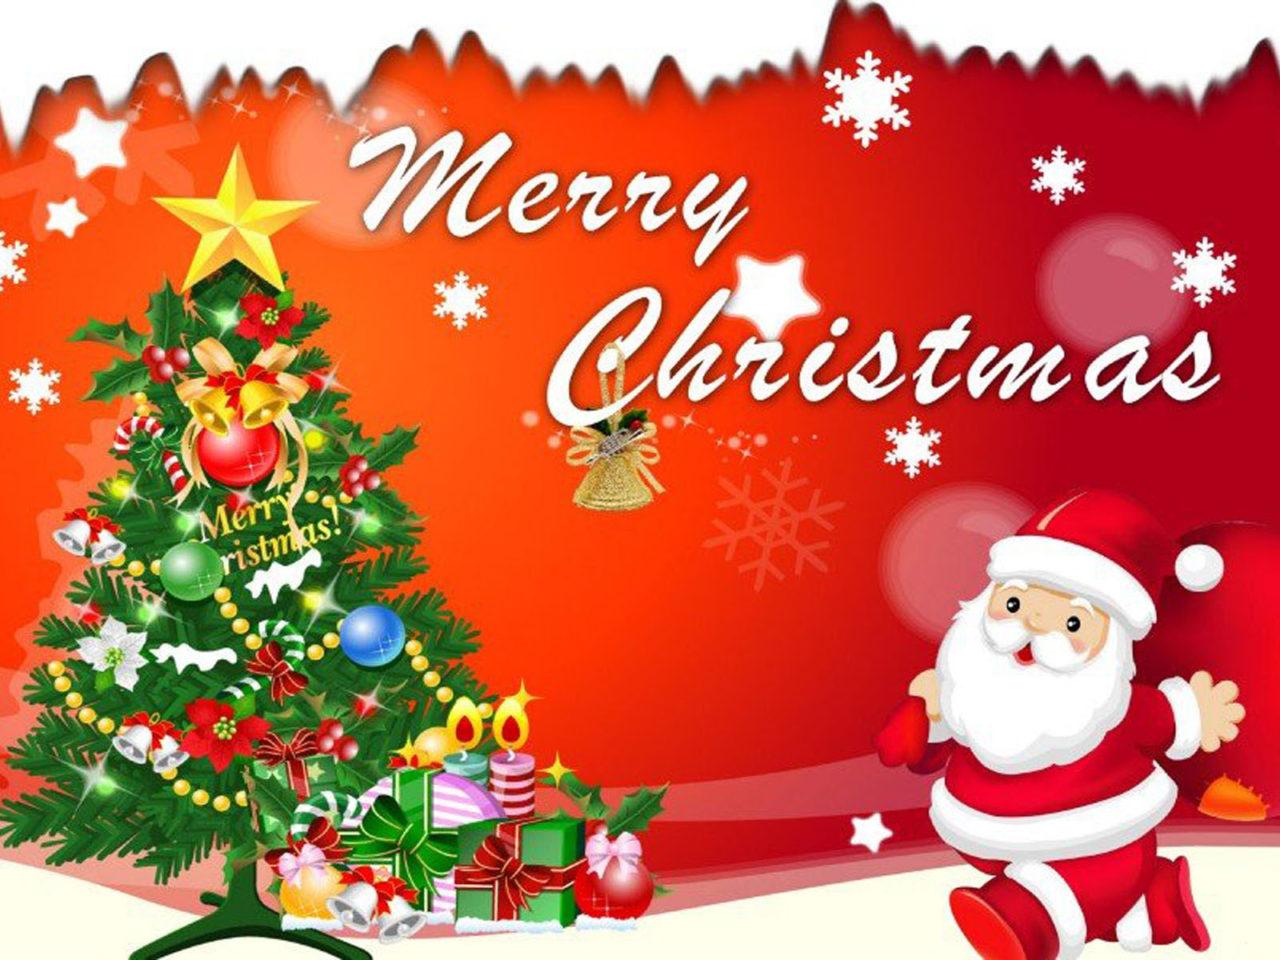 Free Cute Christmas Desktop Wallpaper Merry Christmas Santa Claus Christmas Tree Decorations